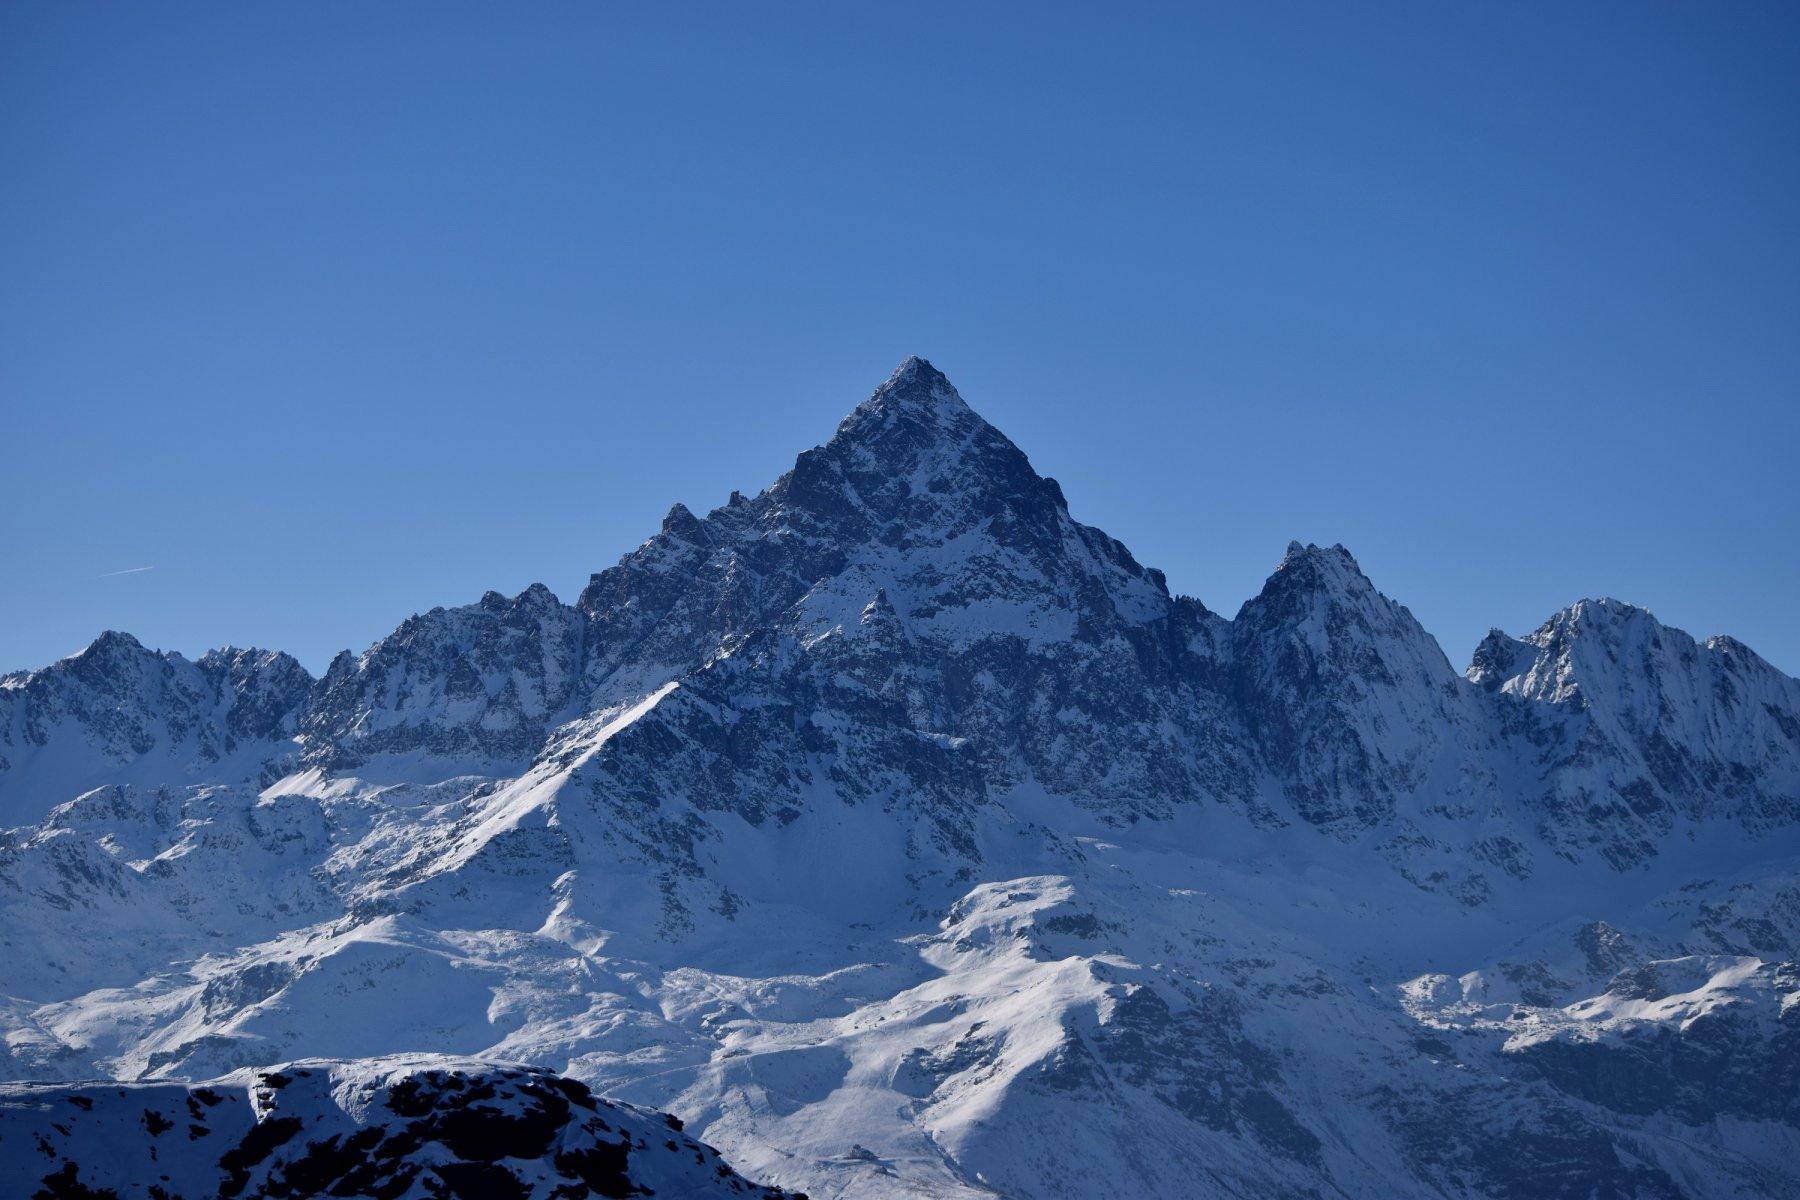 Sua maestà il Monviso (3841 m.s.l.m.) visto da Punta Ostanetta.